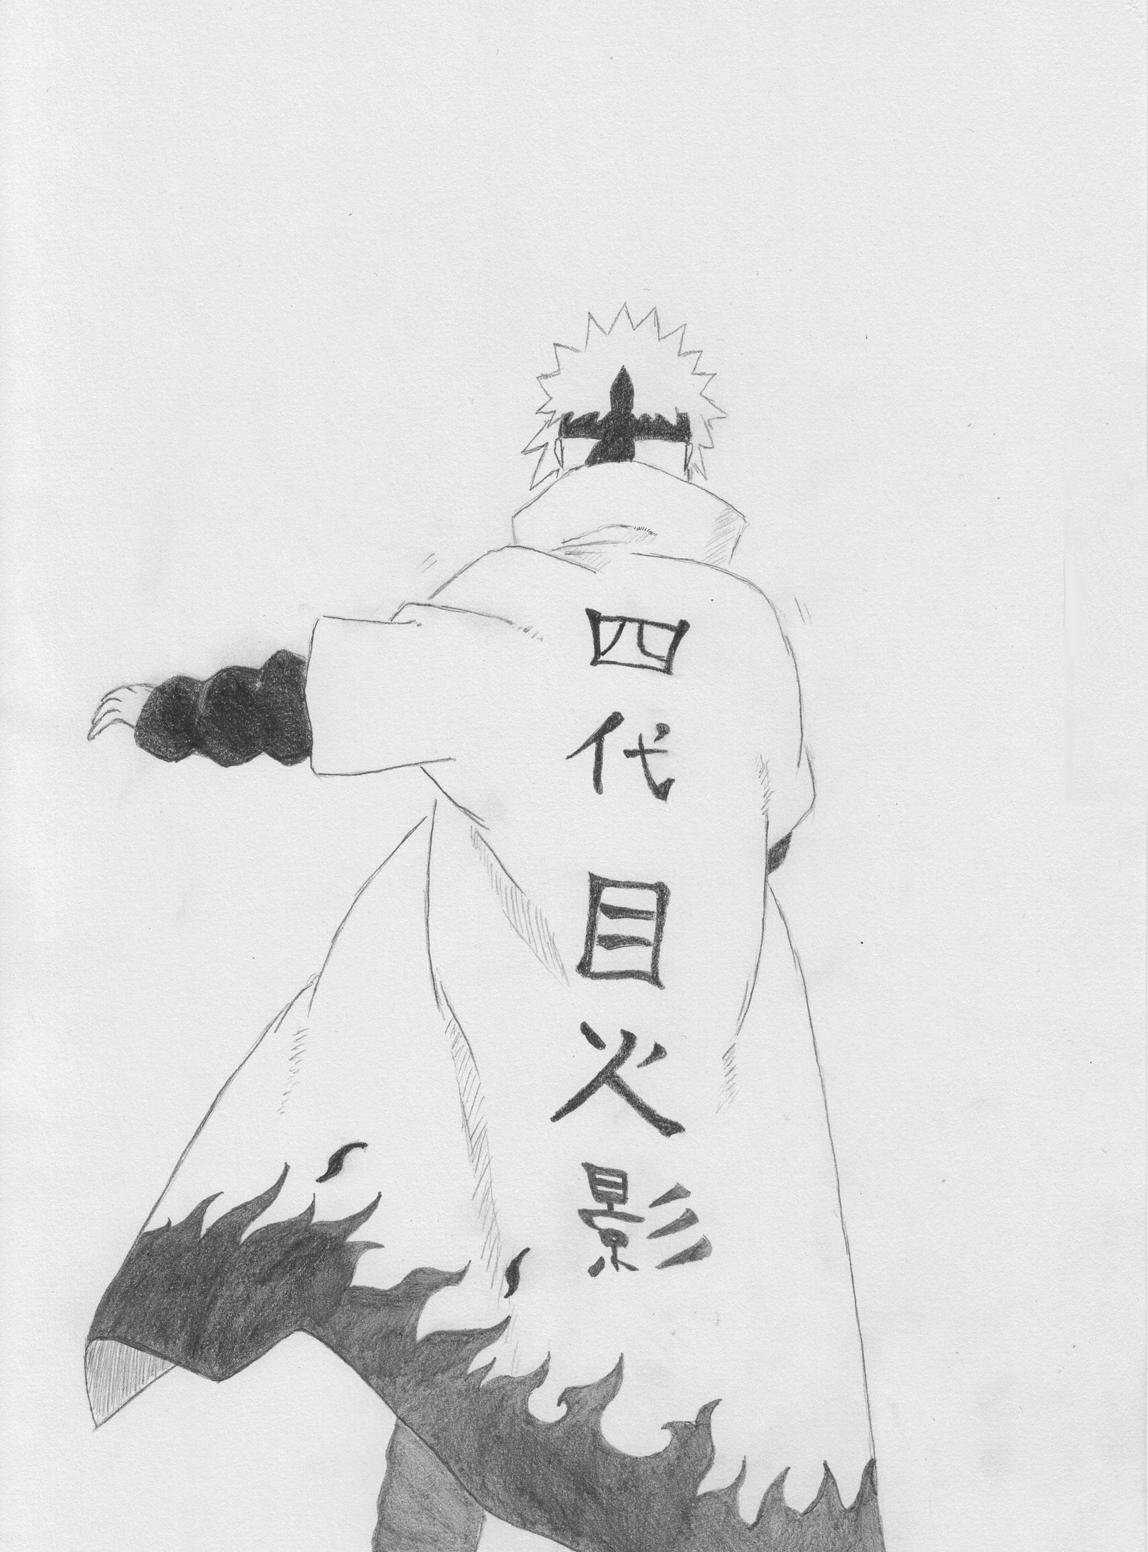 Minato Namikaze by nightmare333 on DeviantArt